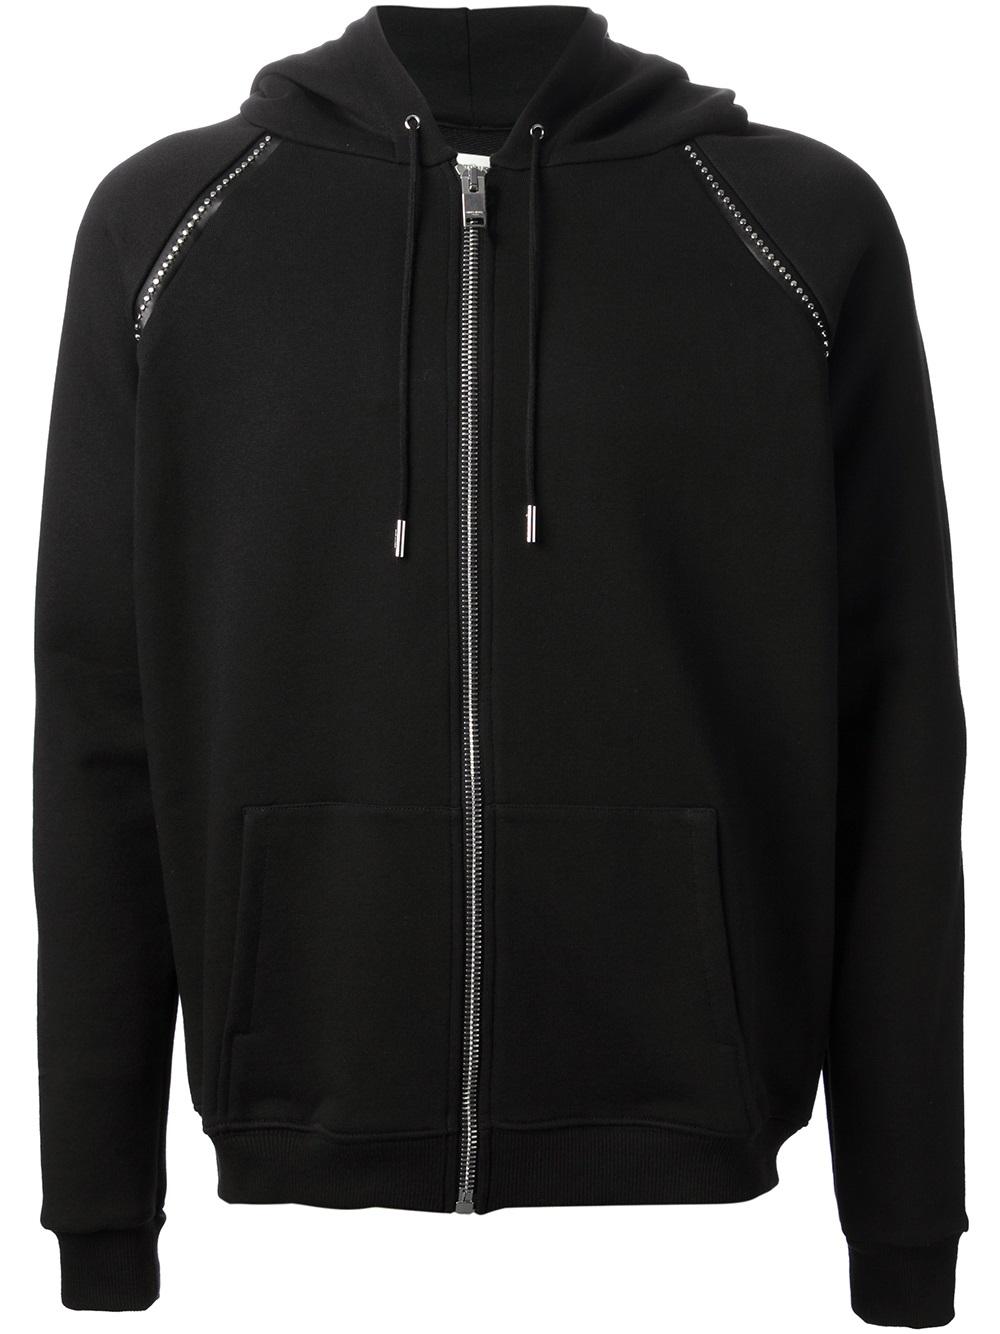 Saint Laurent Studded Hoodie In Black For Men Lyst